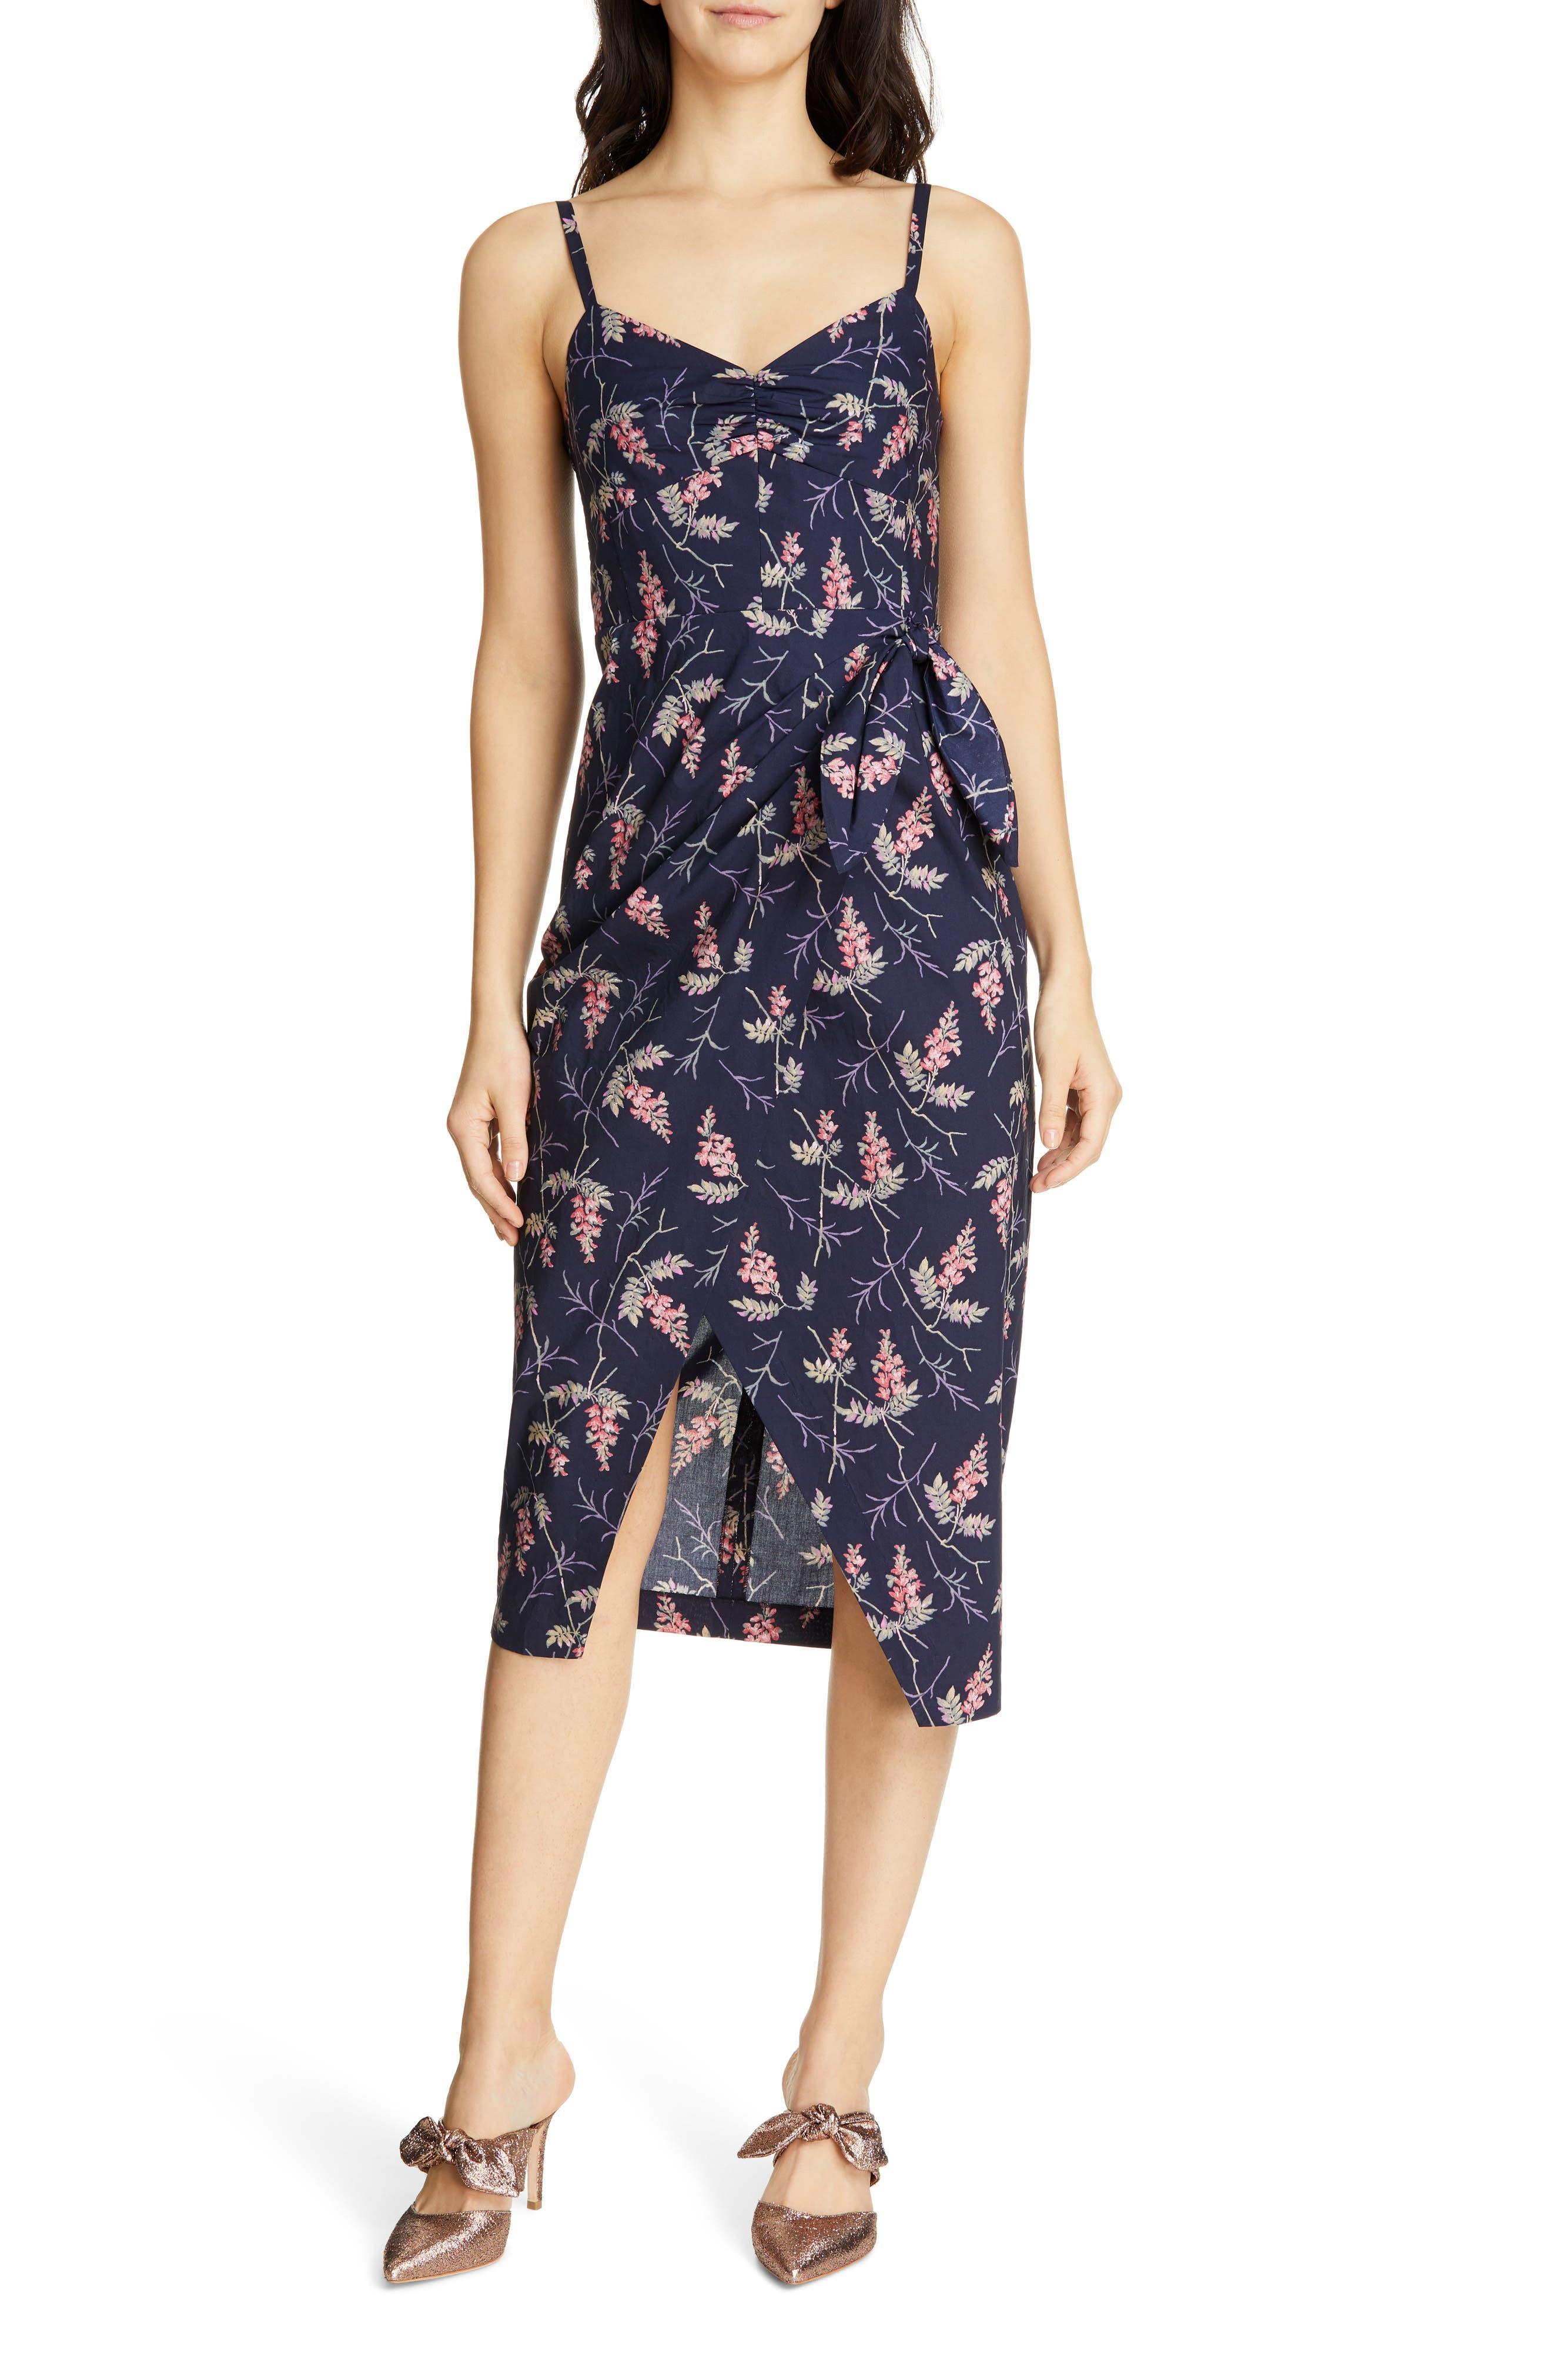 REBECCA TAYLOR Ivie Floral Sleeveless Cotton Midi Sundress, Main, color, NAVY COMBO